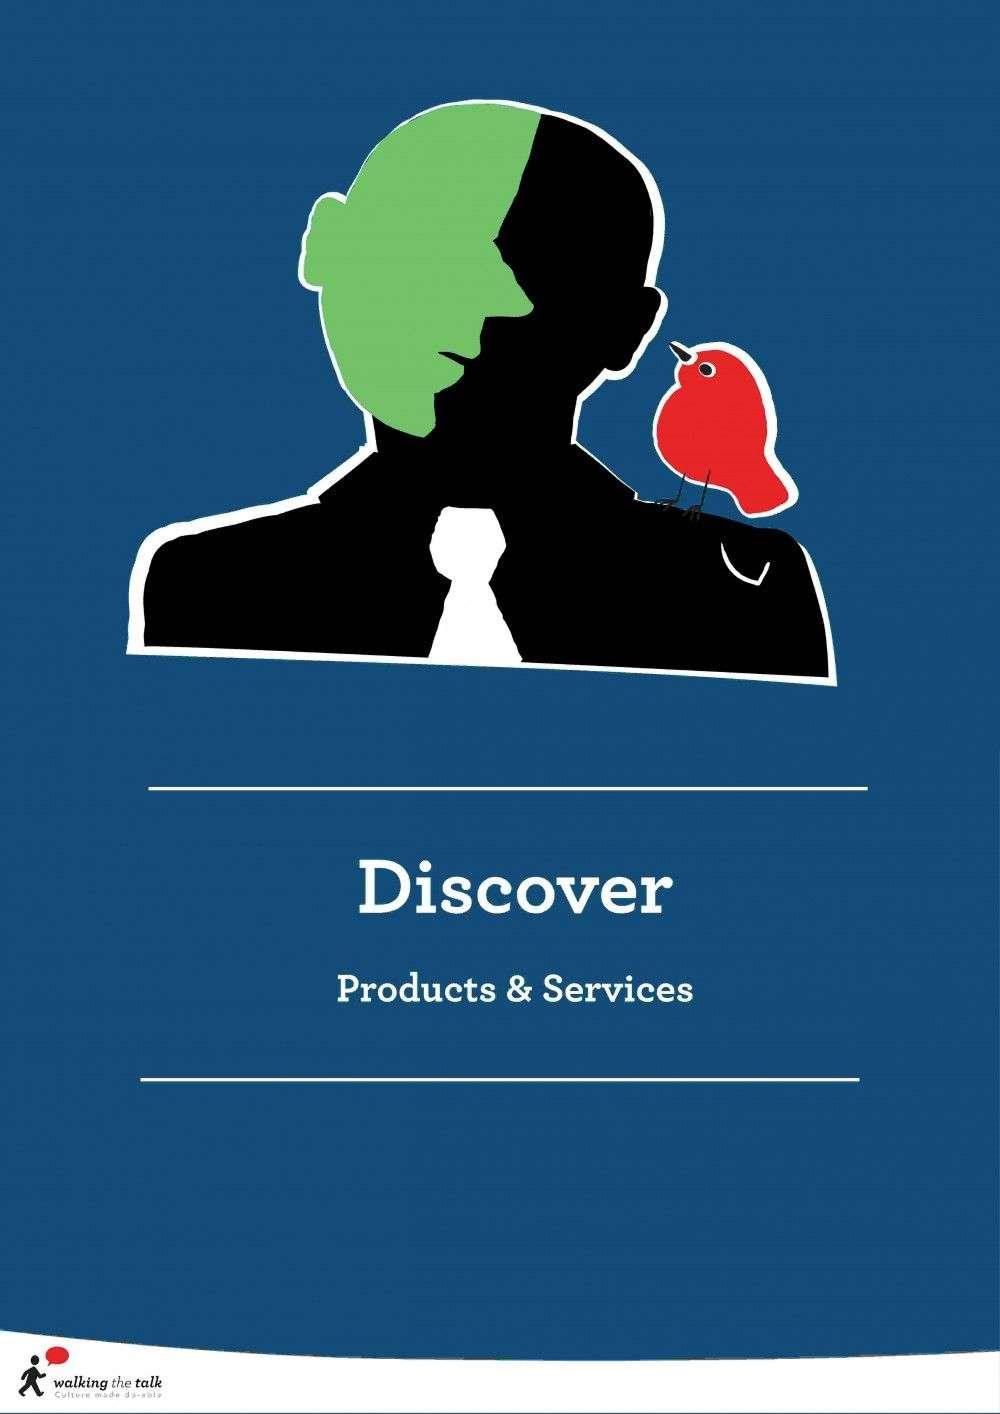 Discover Program | Corporate Culture